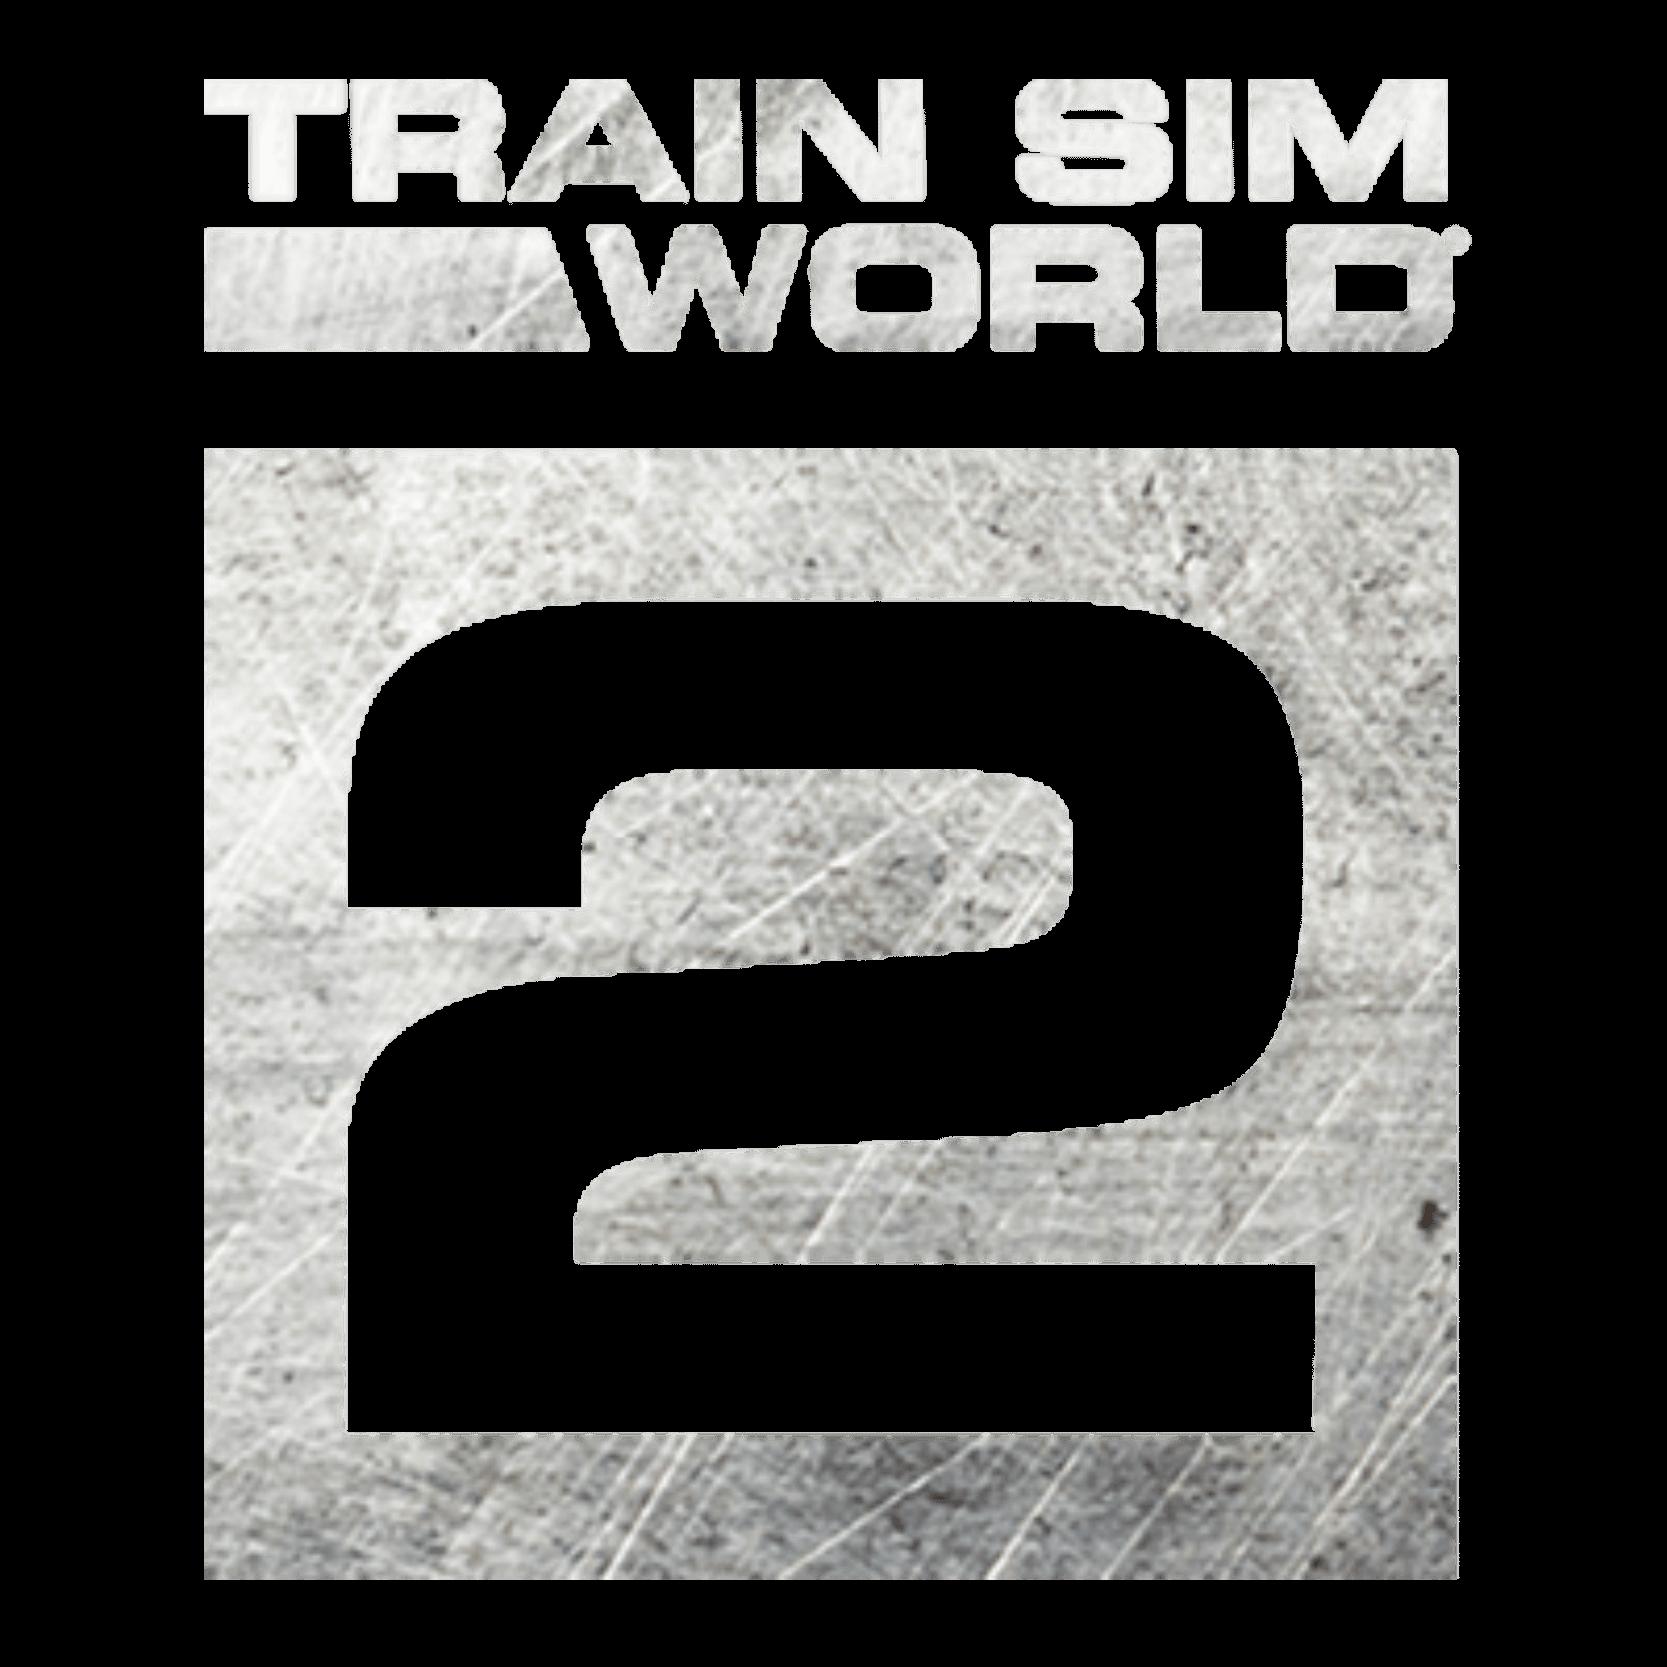 Train Sim World 2 Coming Soon - Epic Games Store